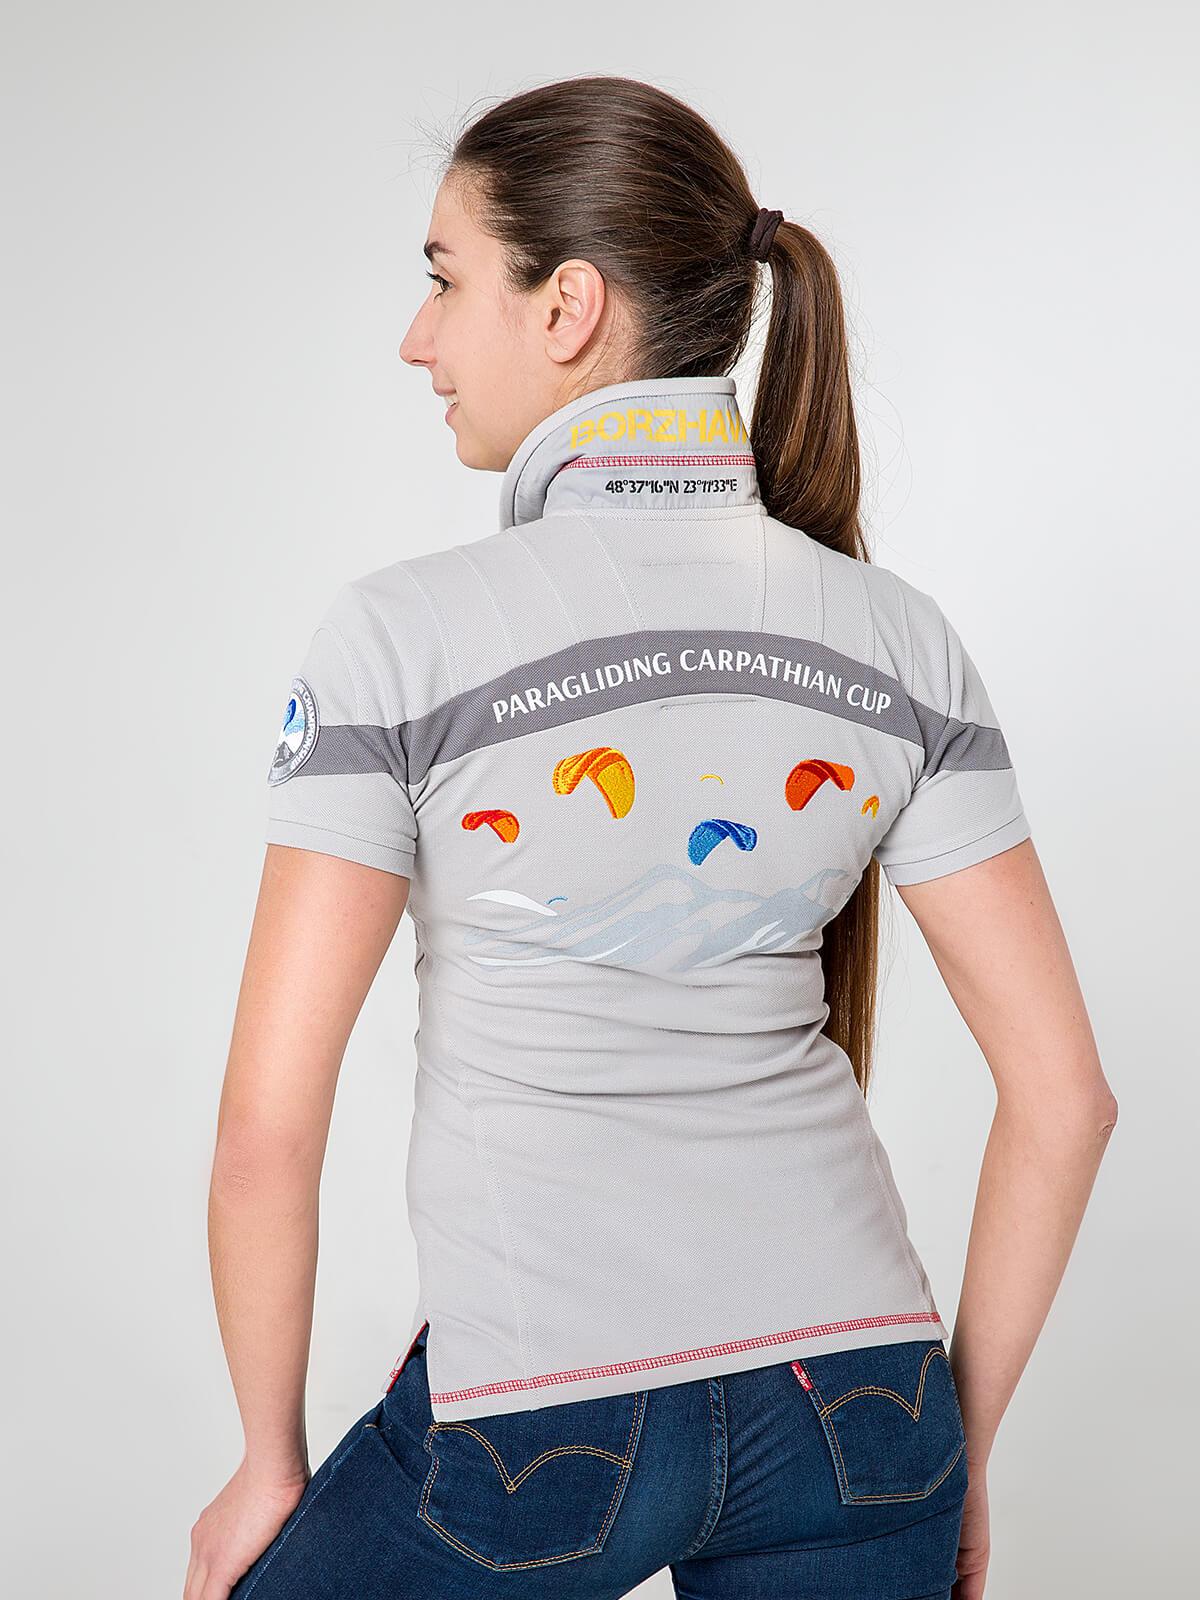 Women's Polo Shirt Borzhava. Color gray.  Technique of prints applied: embroidery, silkscreen printing.